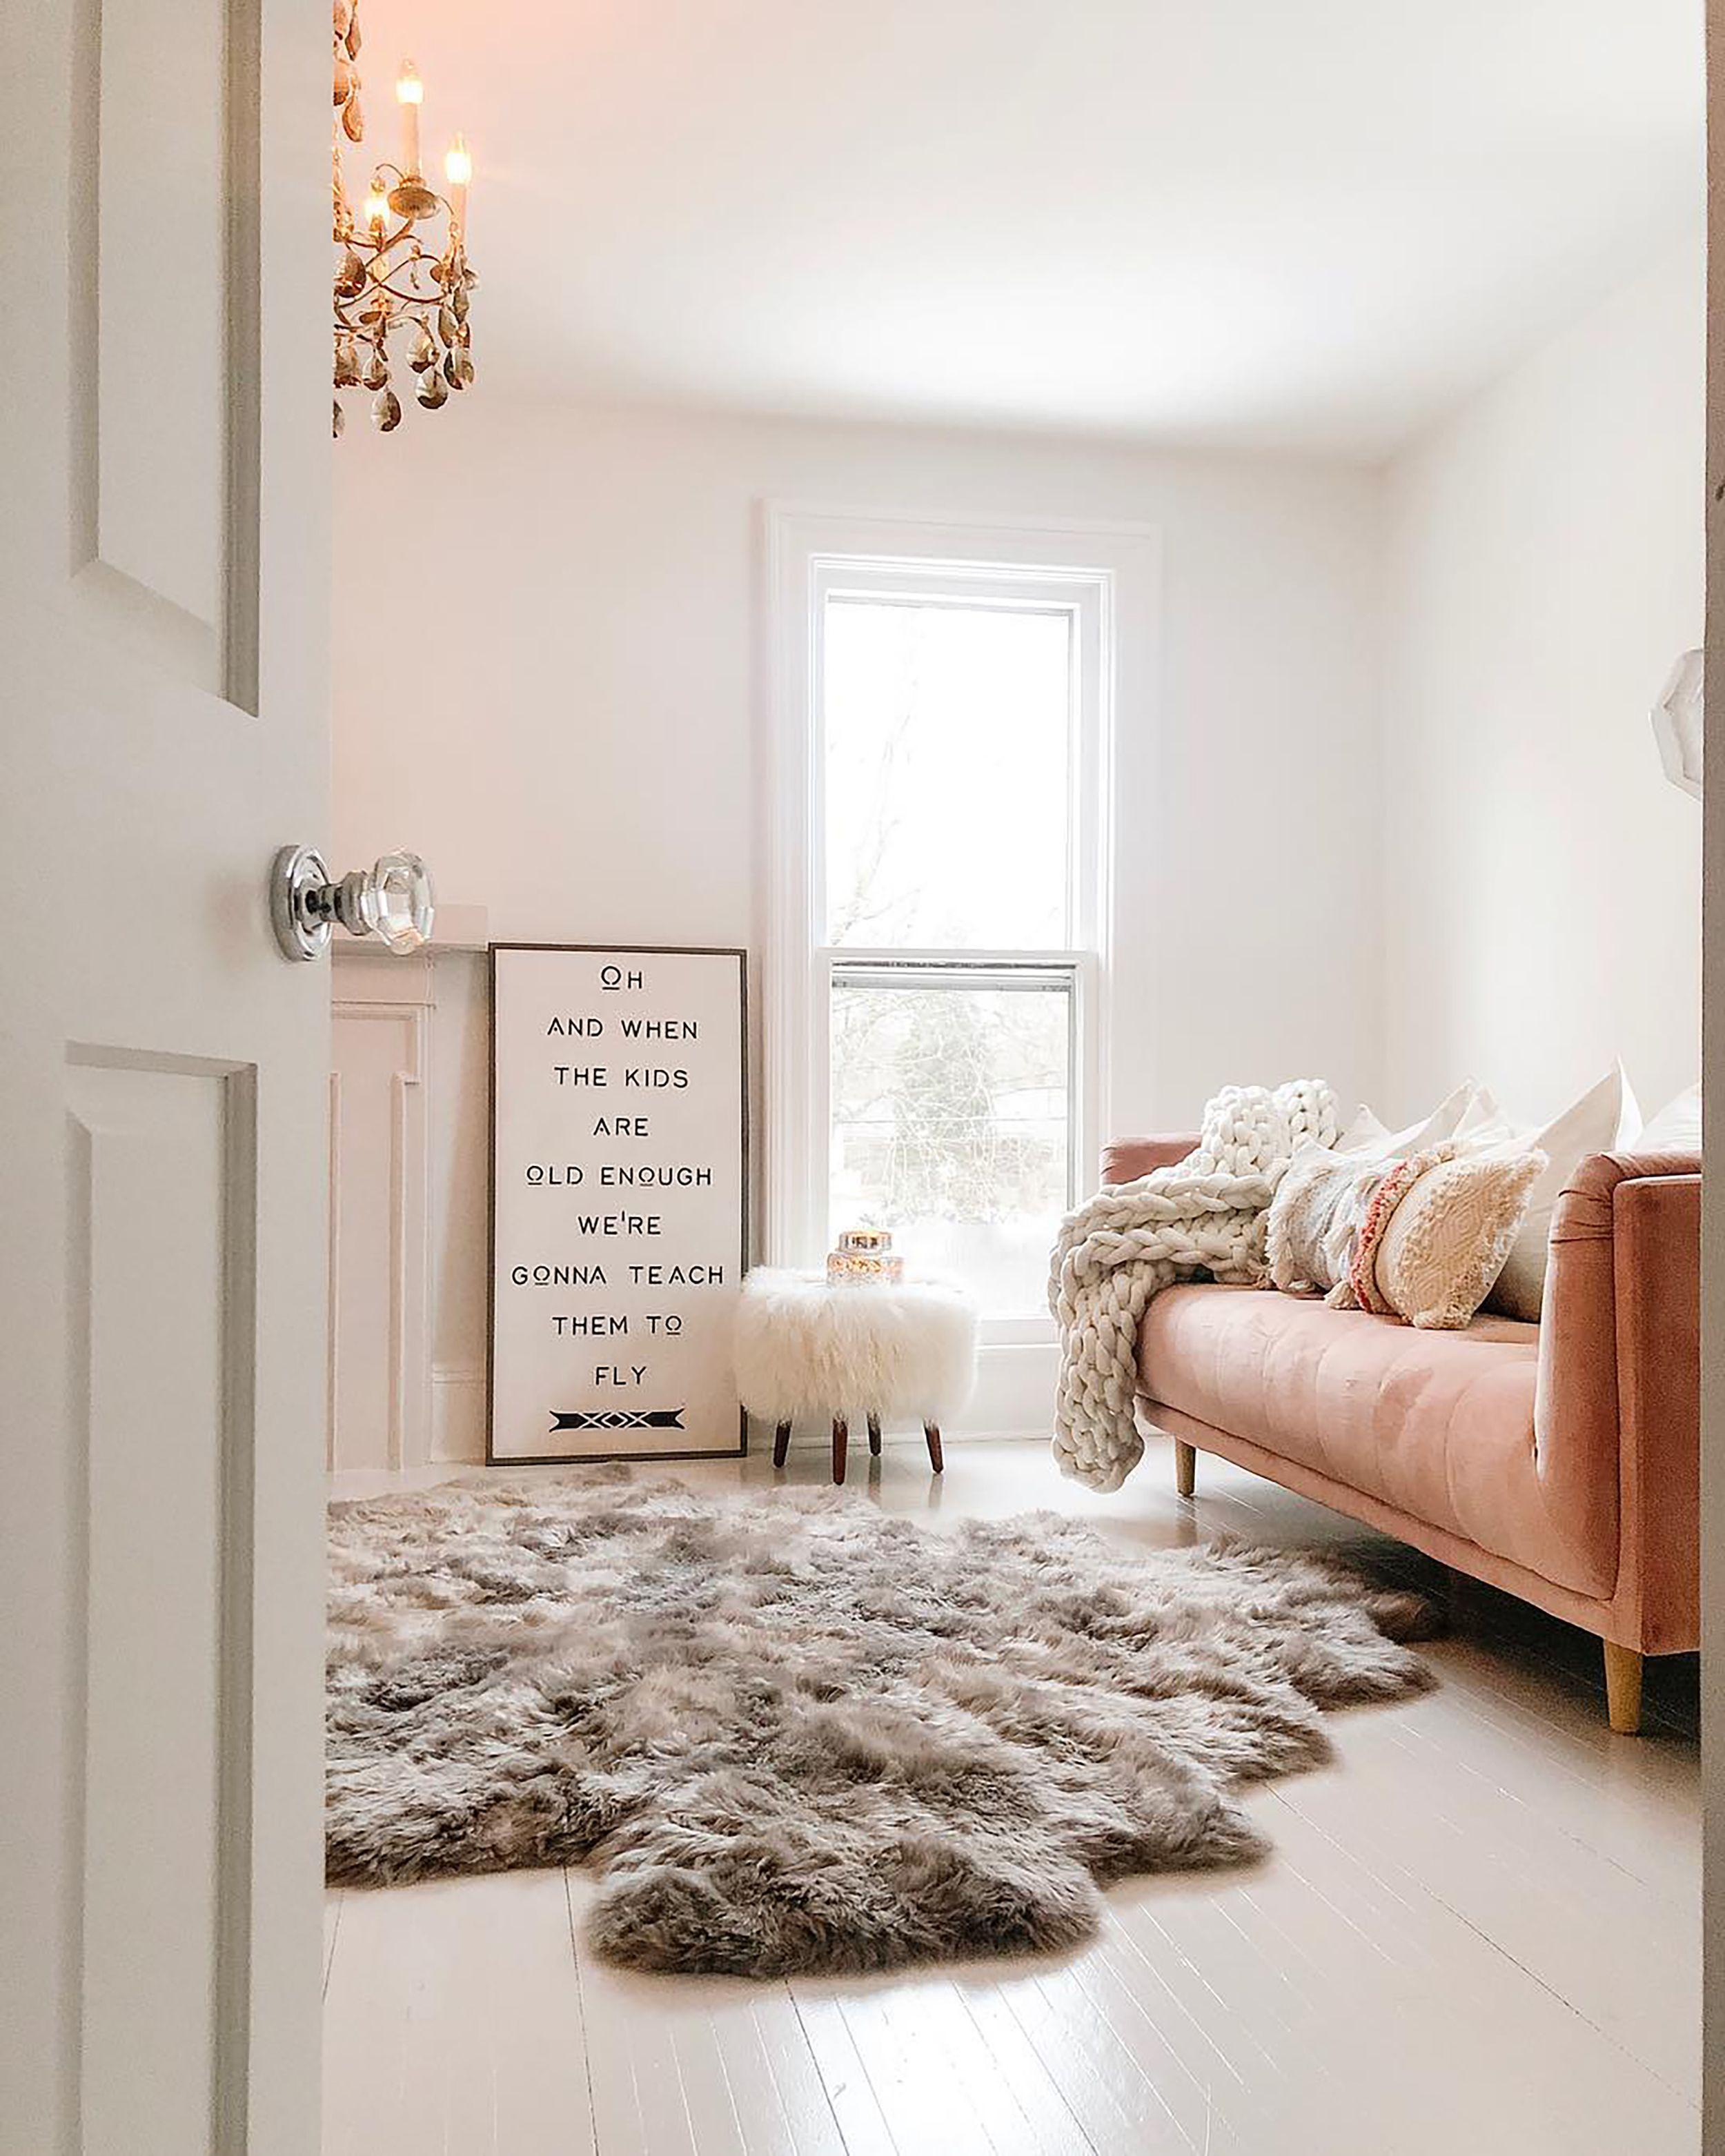 Sheepskin Wool Vole Rug Arhaus Living Room Decor Sheepskin Rug Home